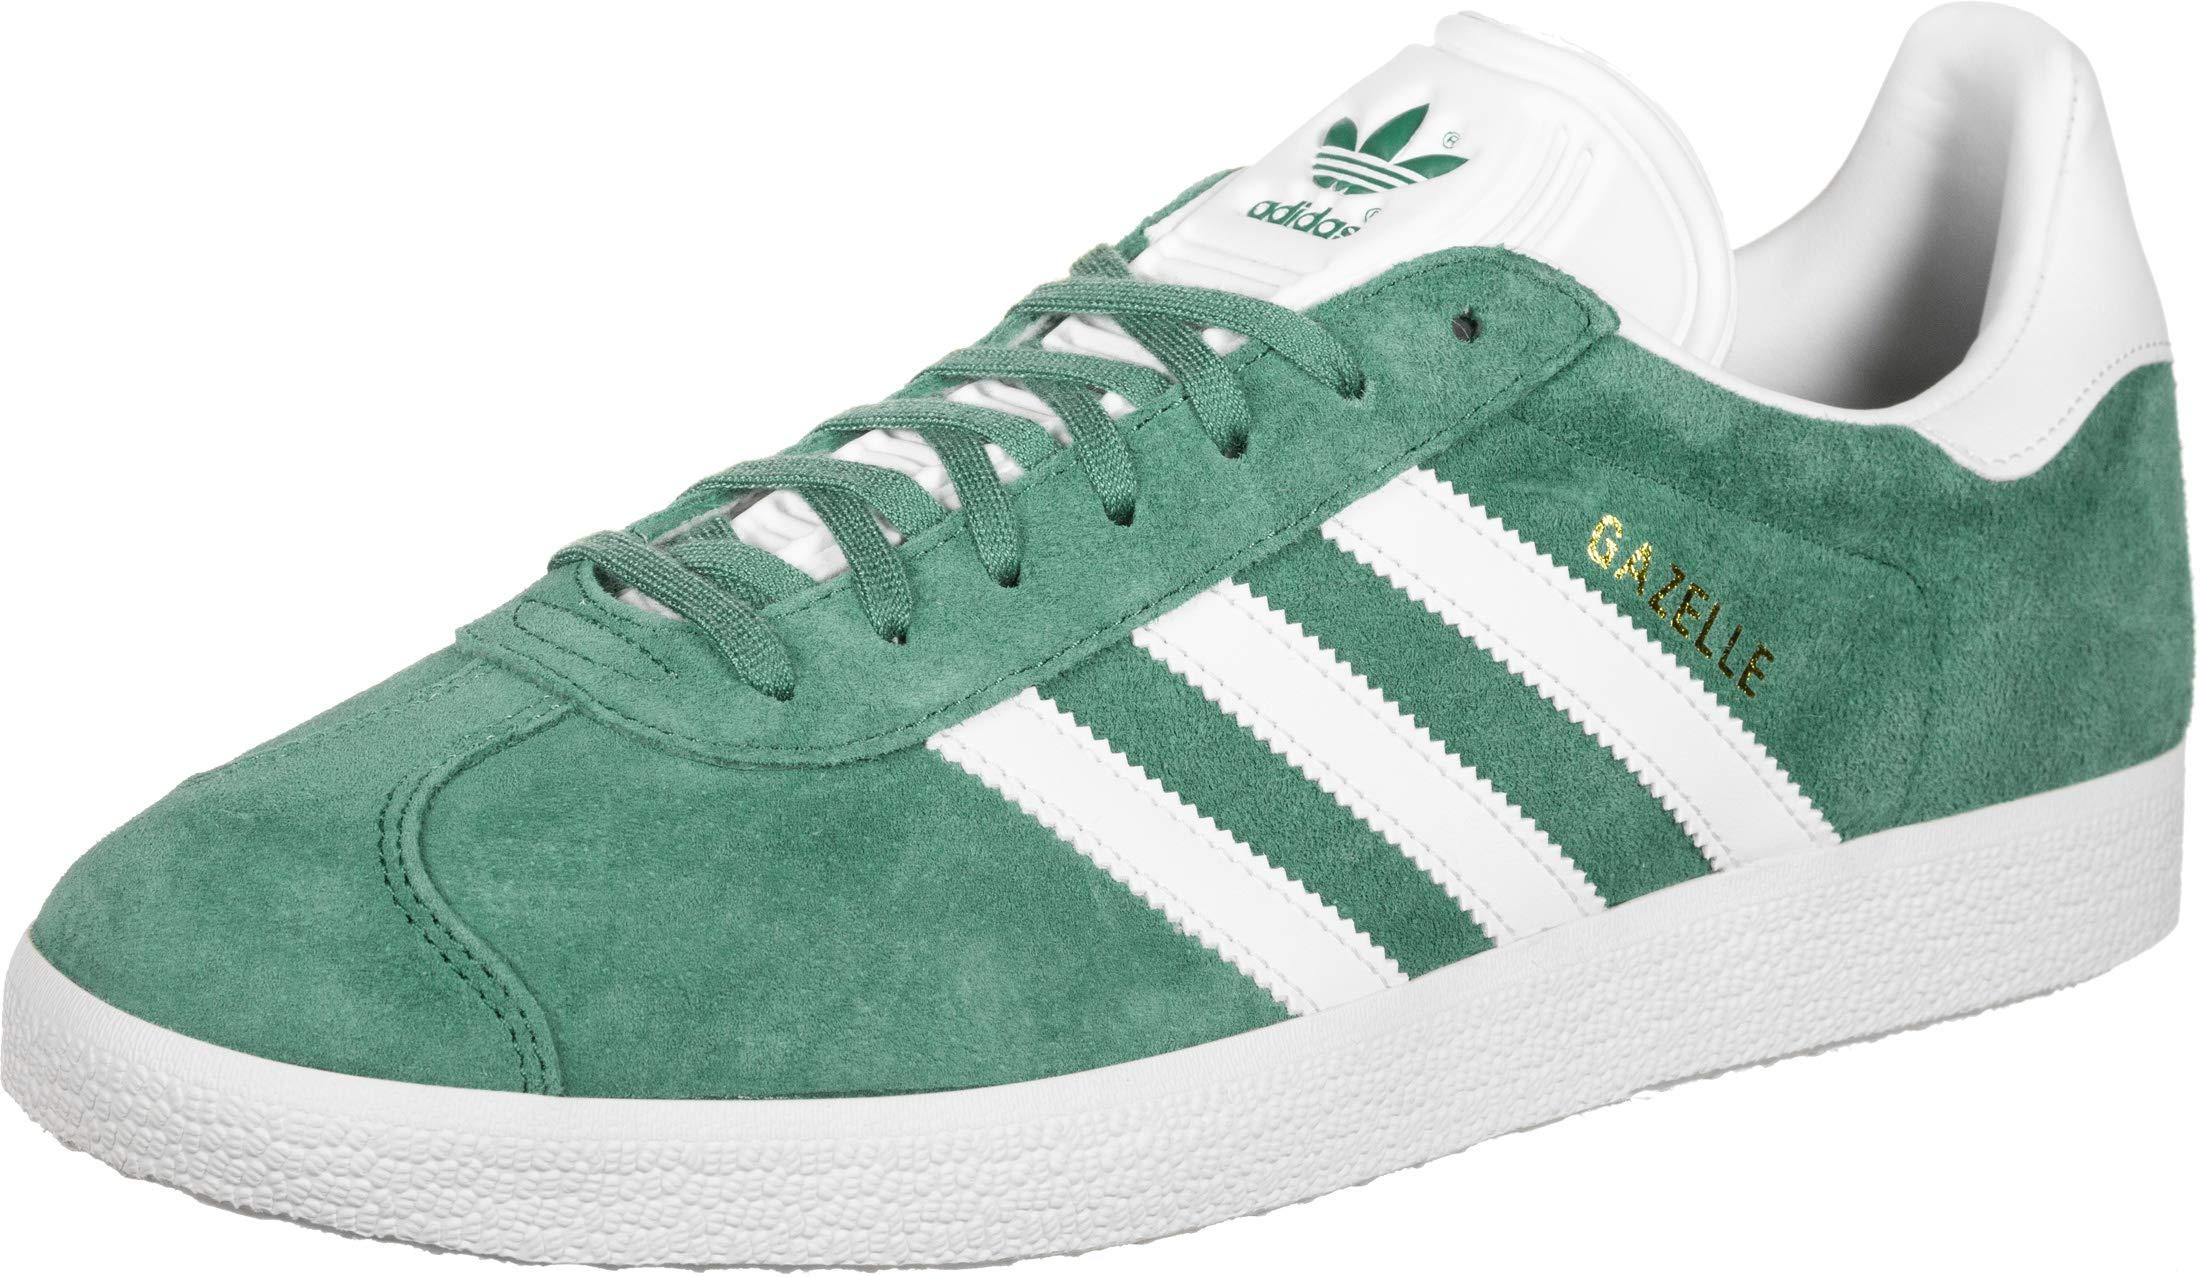 adidas Gazelle Shoes- Buy Online in